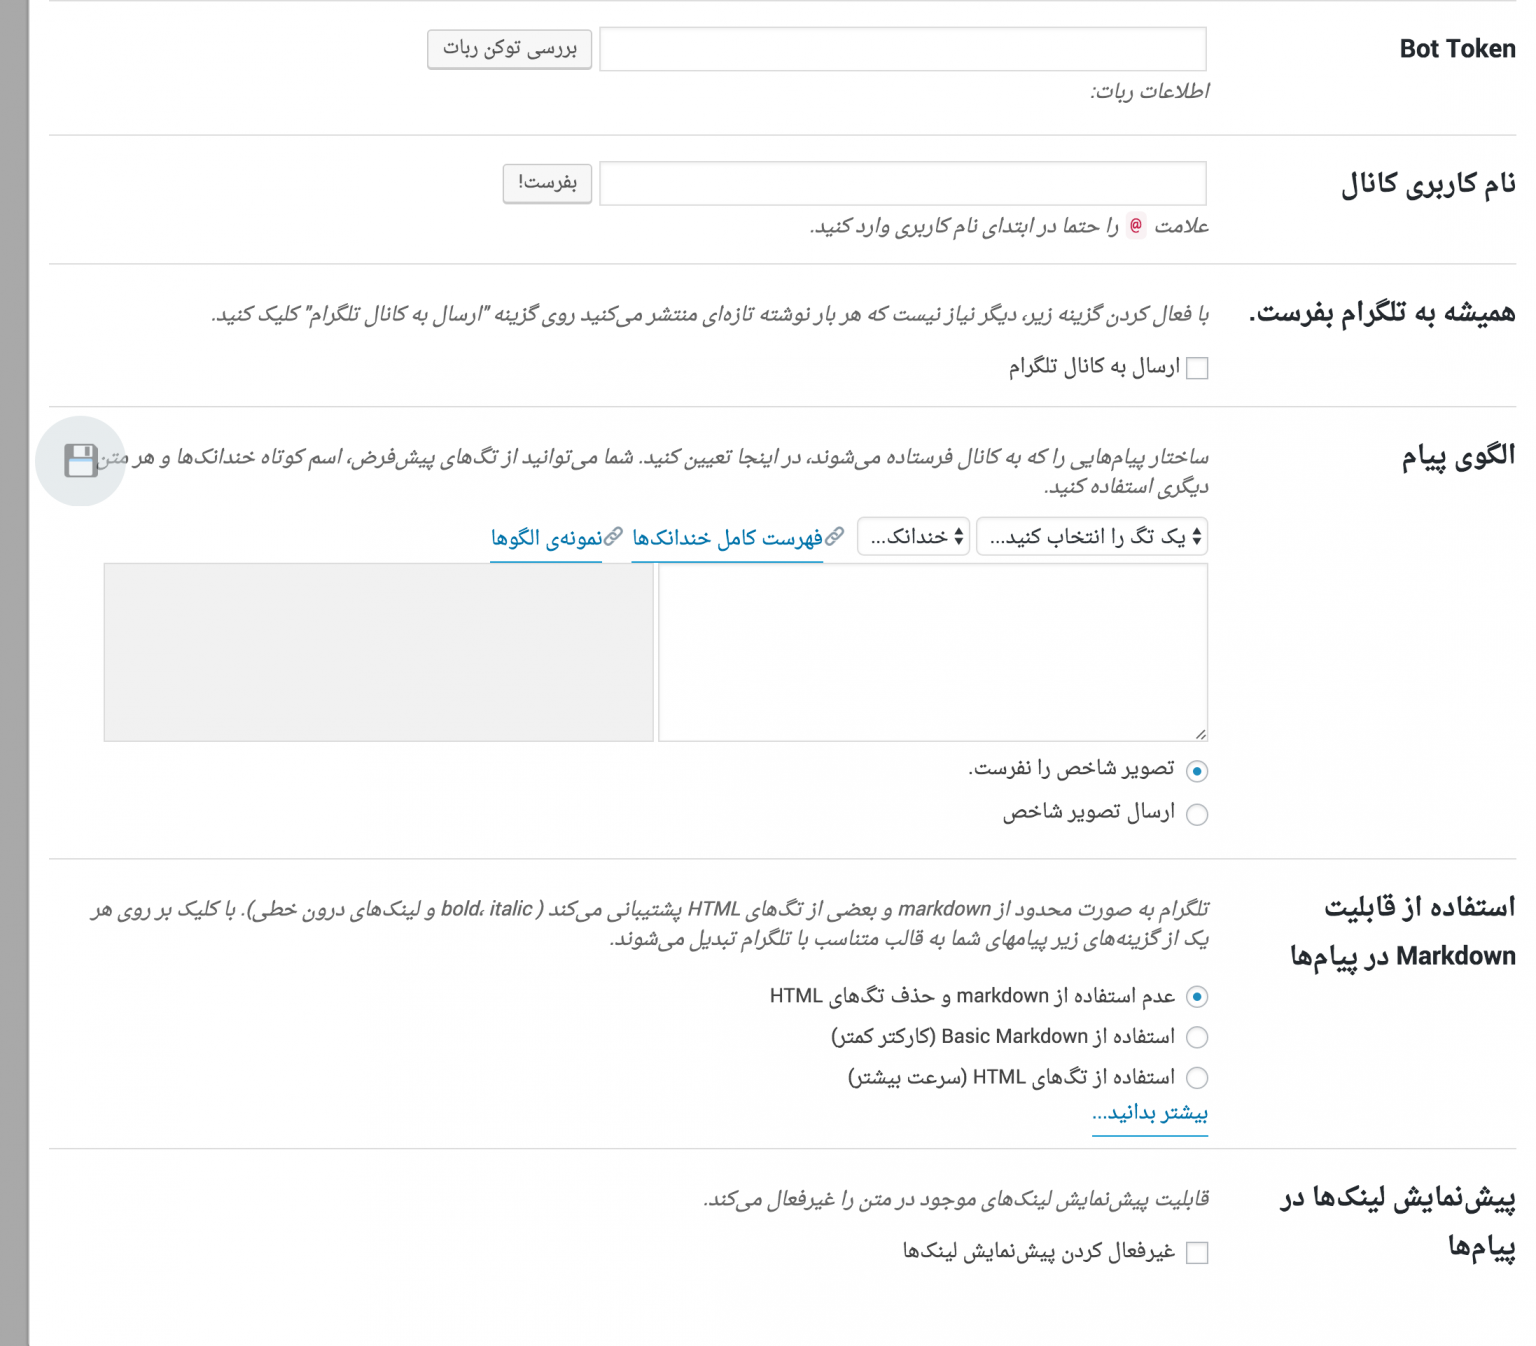 twp-screenshot2-hamyarwp-768x673@2x